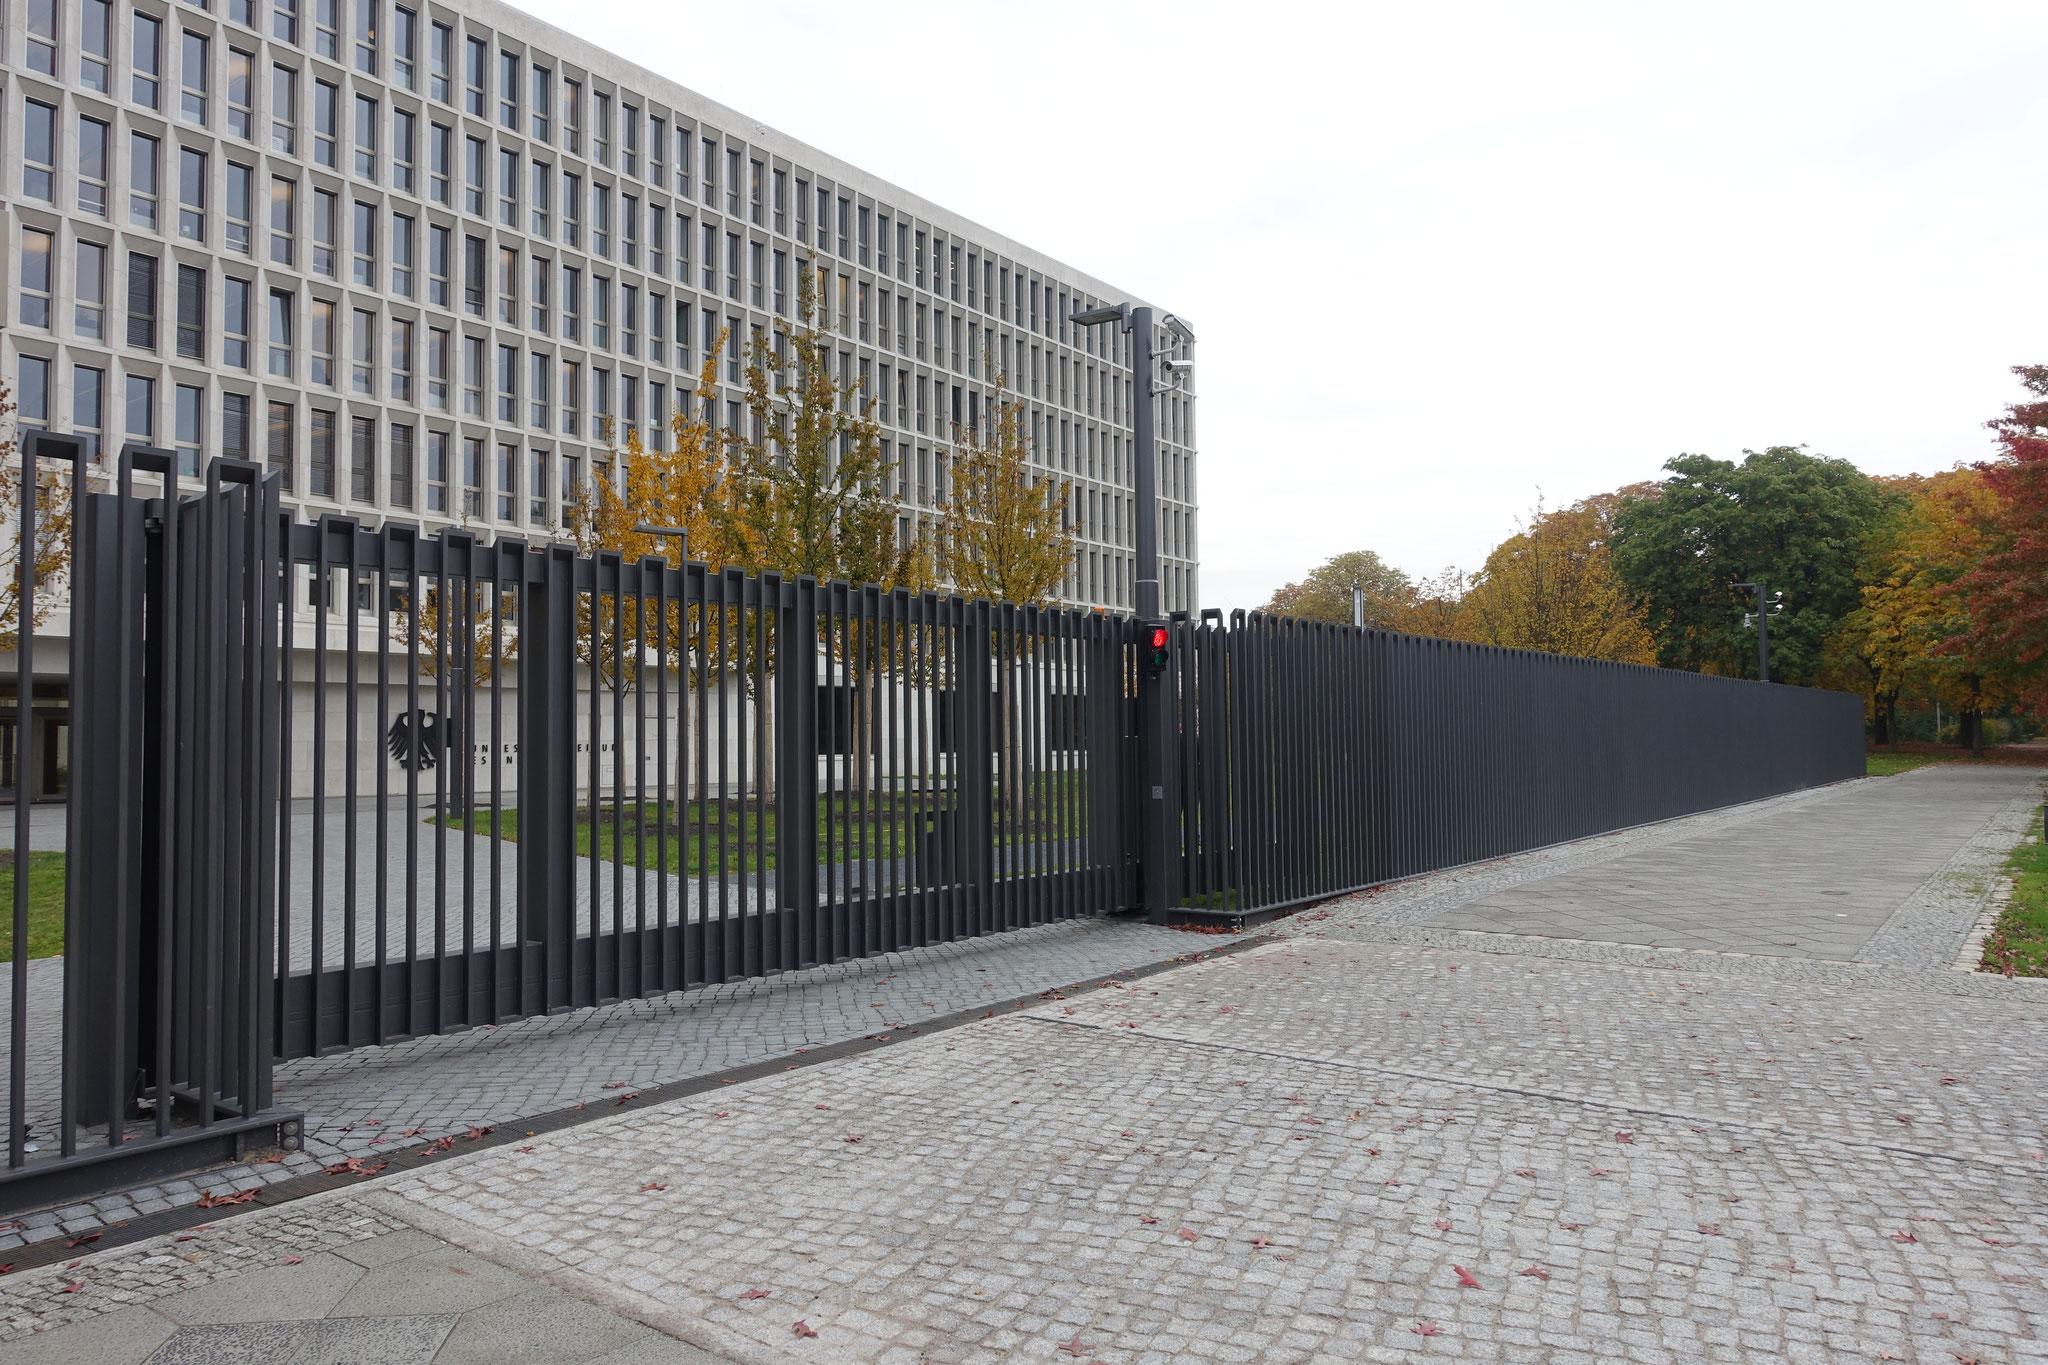 Sicherheitszaun nach Architektendesign Modell Moabit